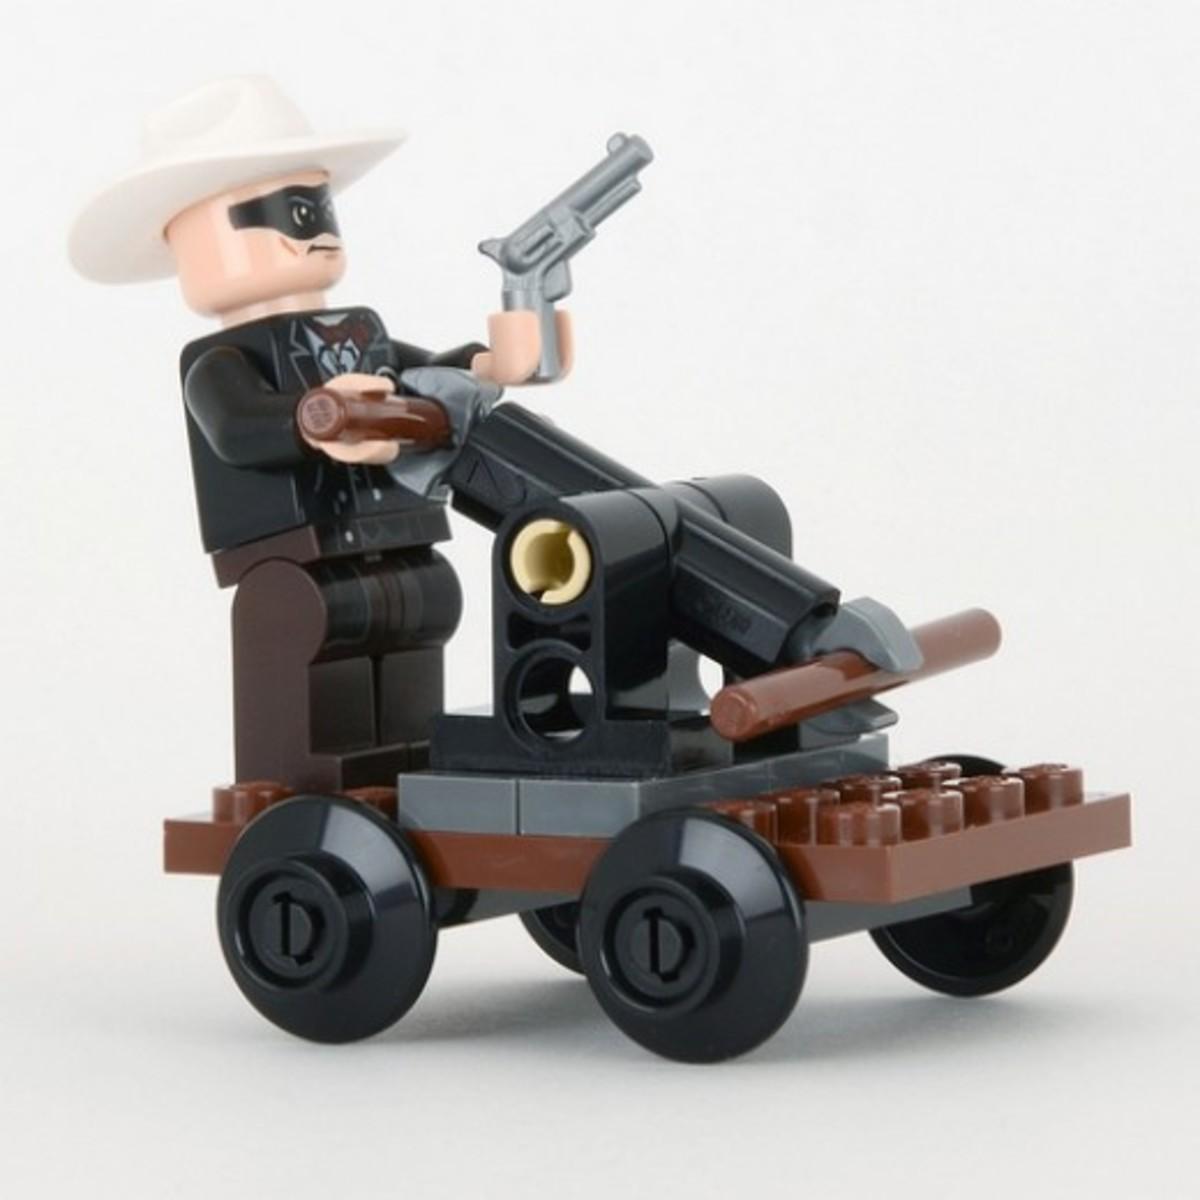 LEGO The Lone Ranger's Pump Car 30260 Assembled